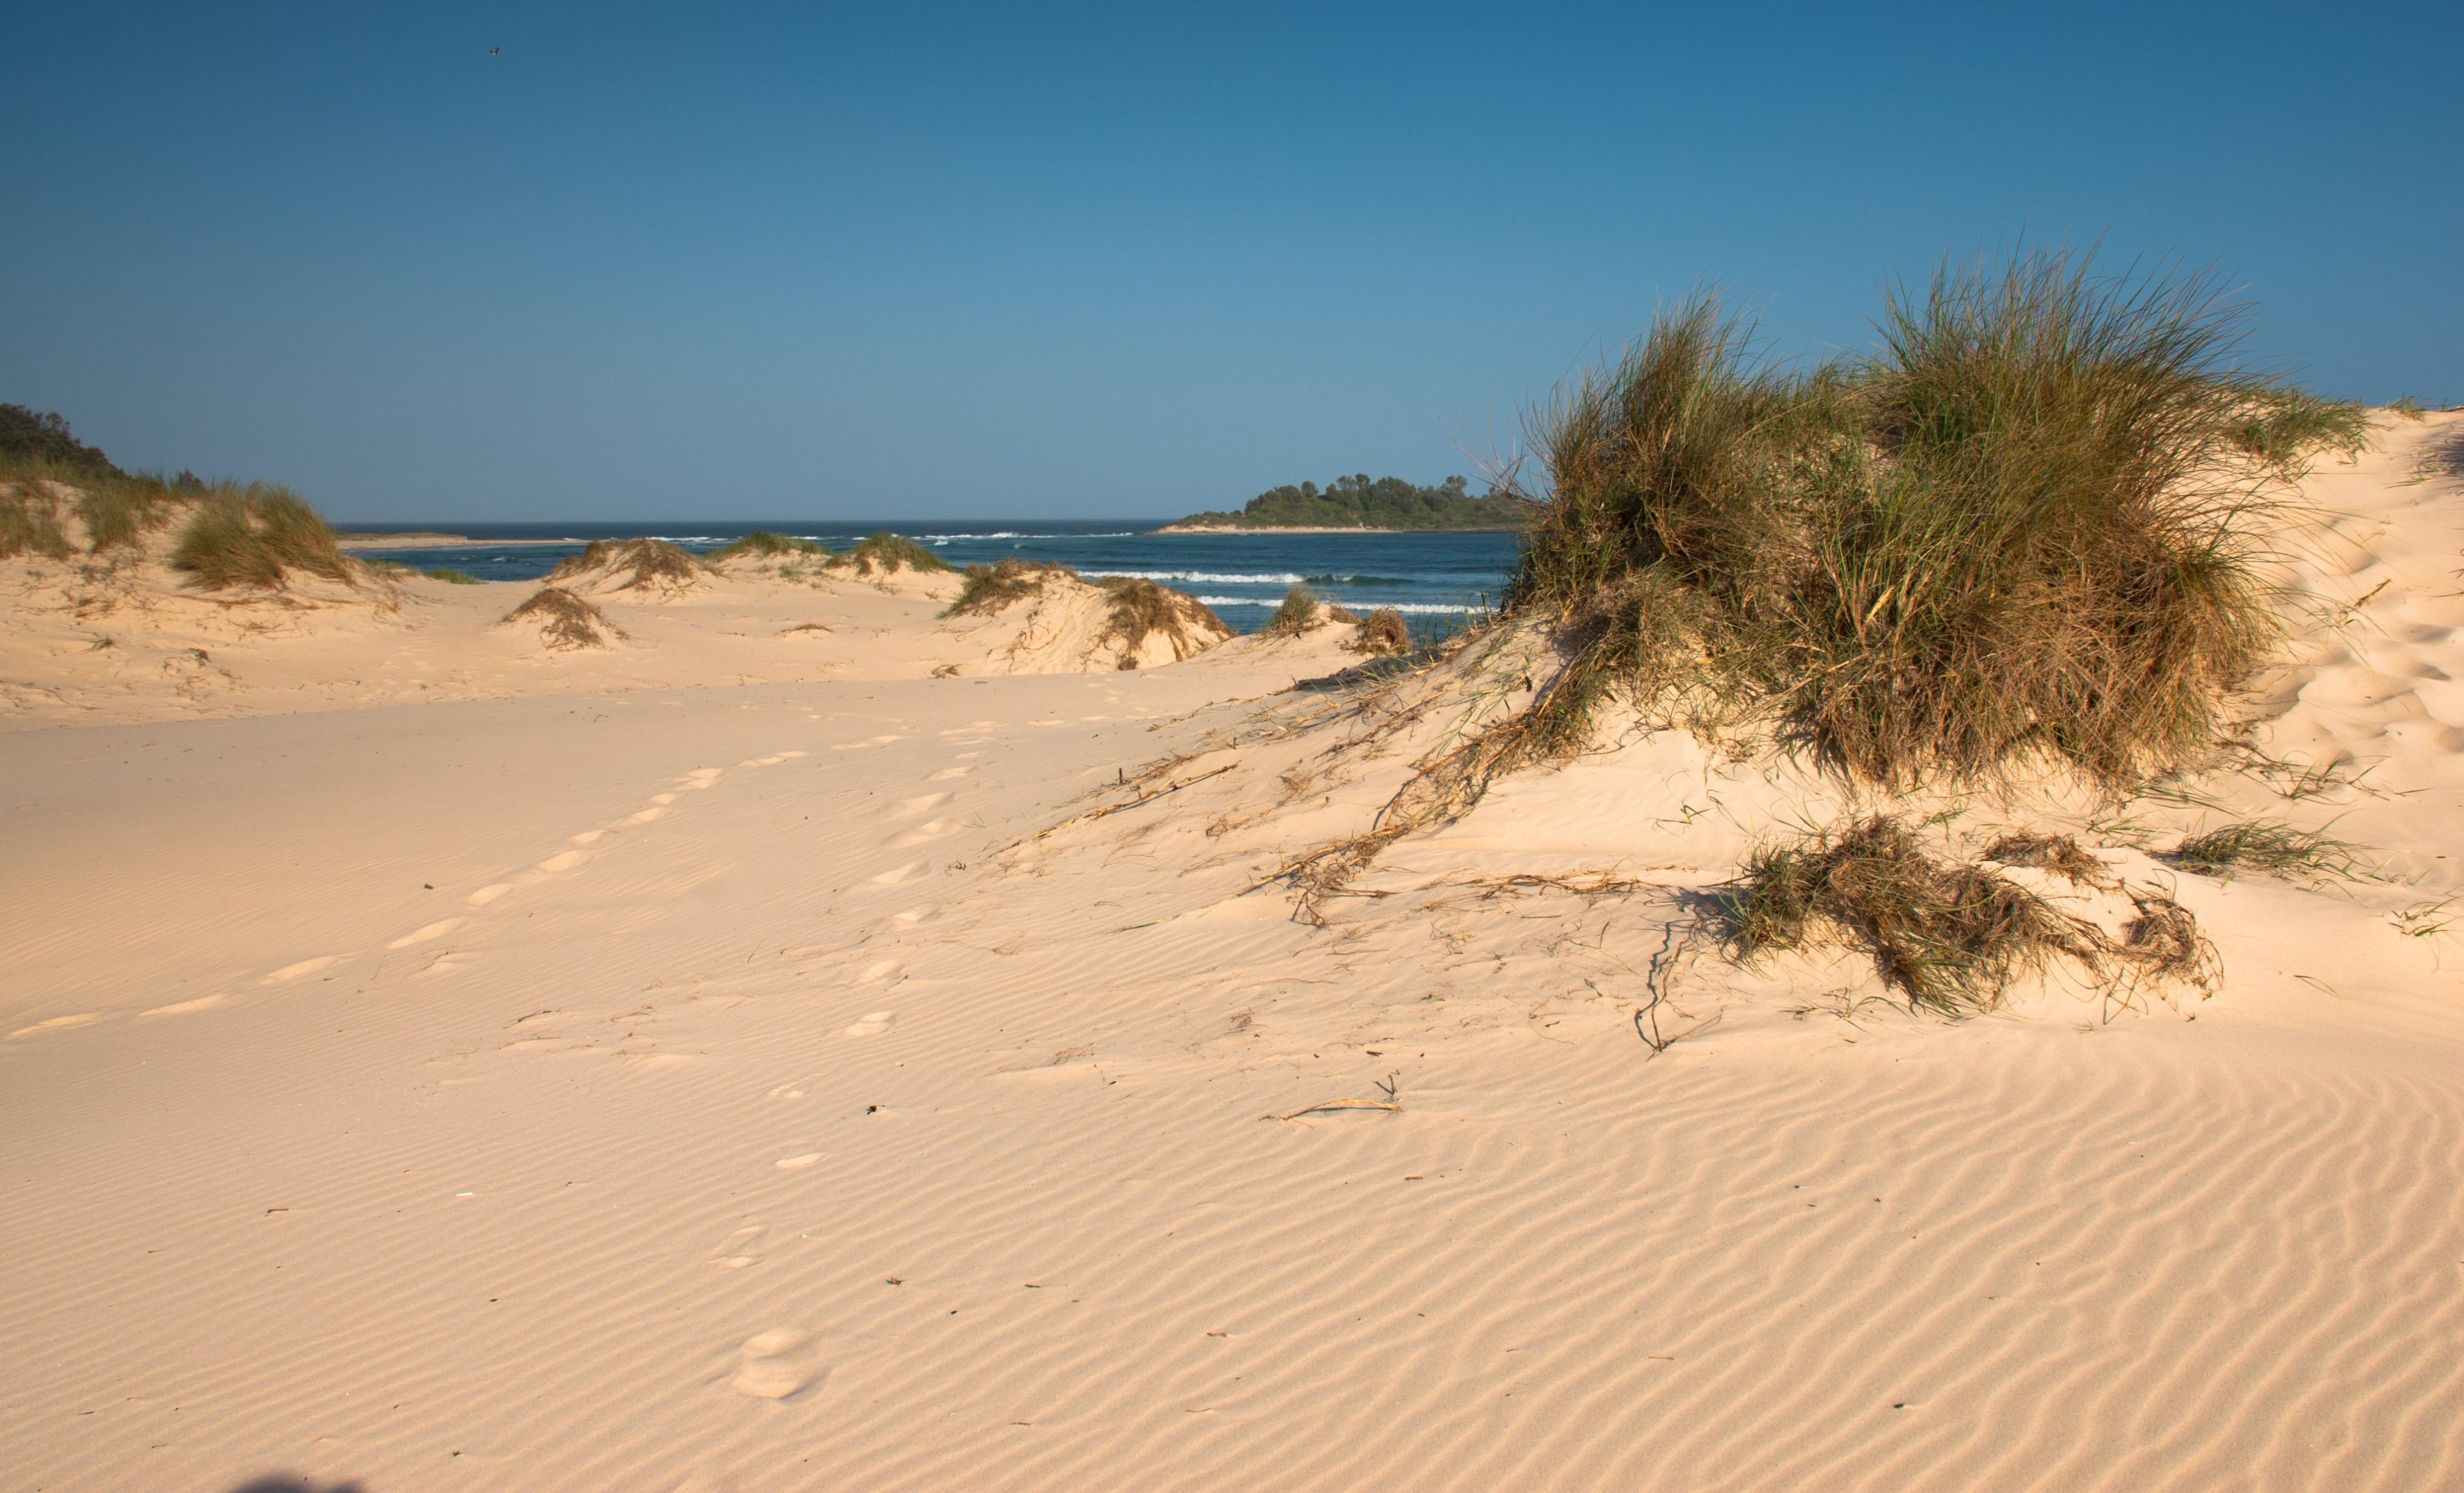 Lake Conjola, New South Wales, Australia